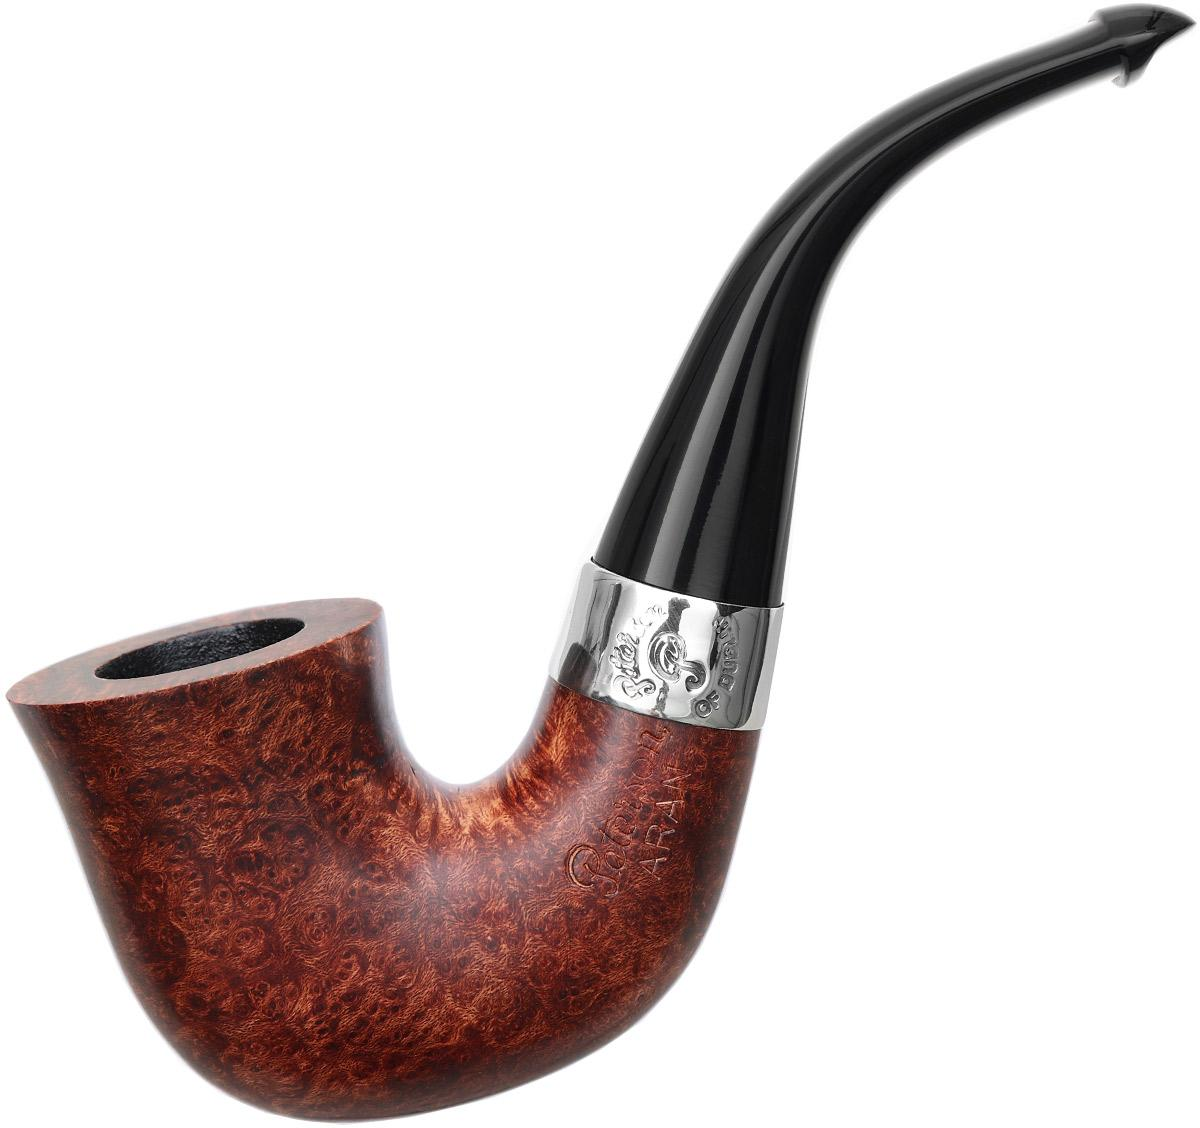 Peterson Aran Smooth Nickel Mounted (05) P-Lip